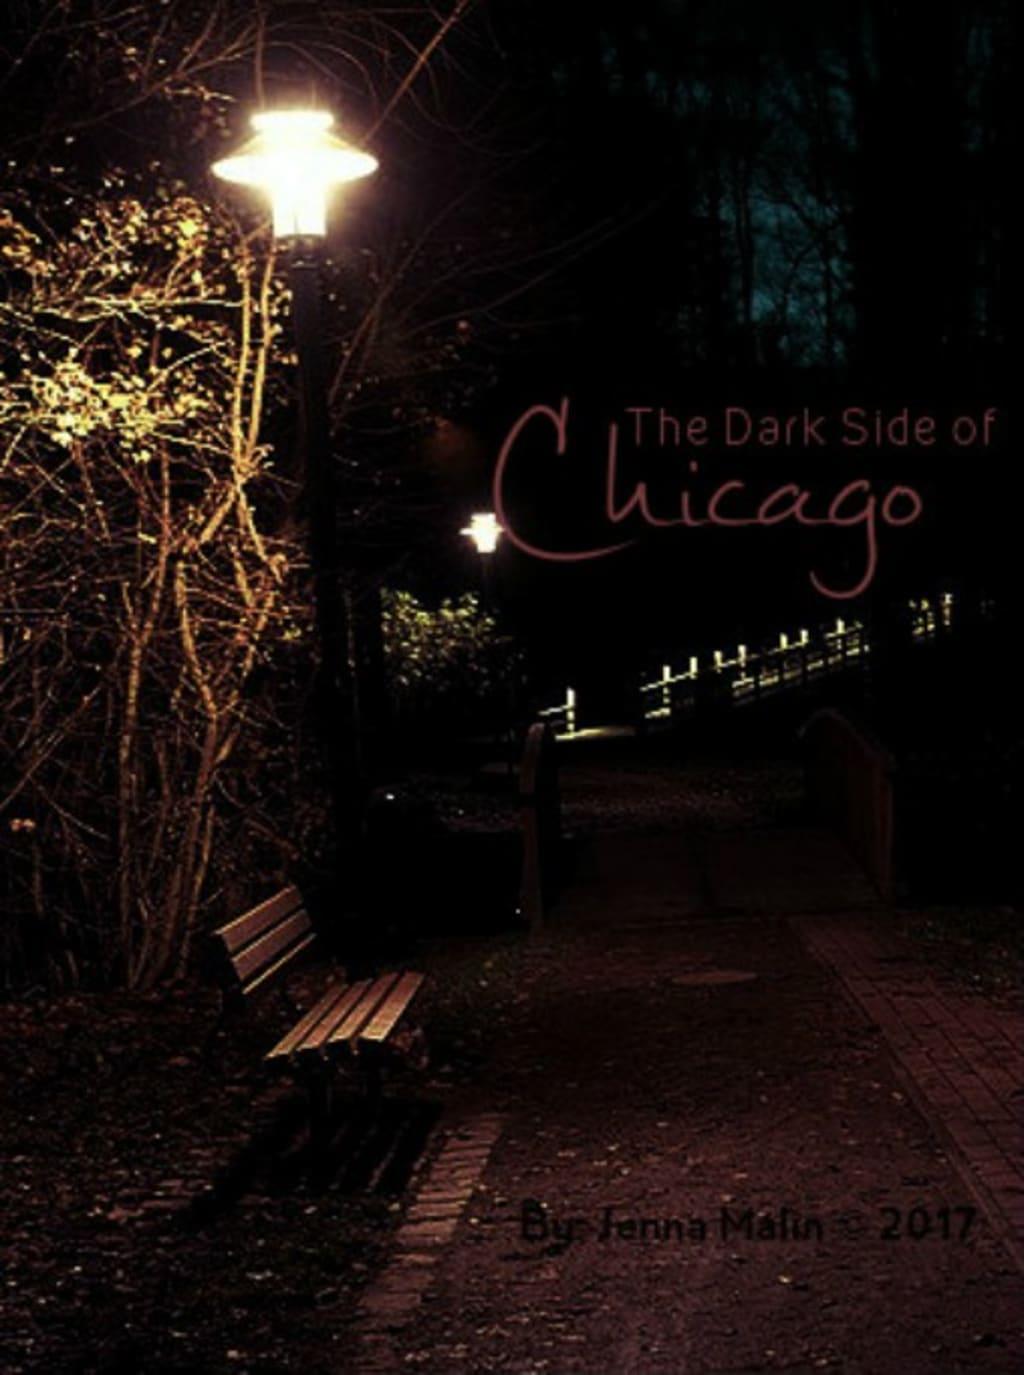 The Dark Side of Chicago (Pt. 1/3)